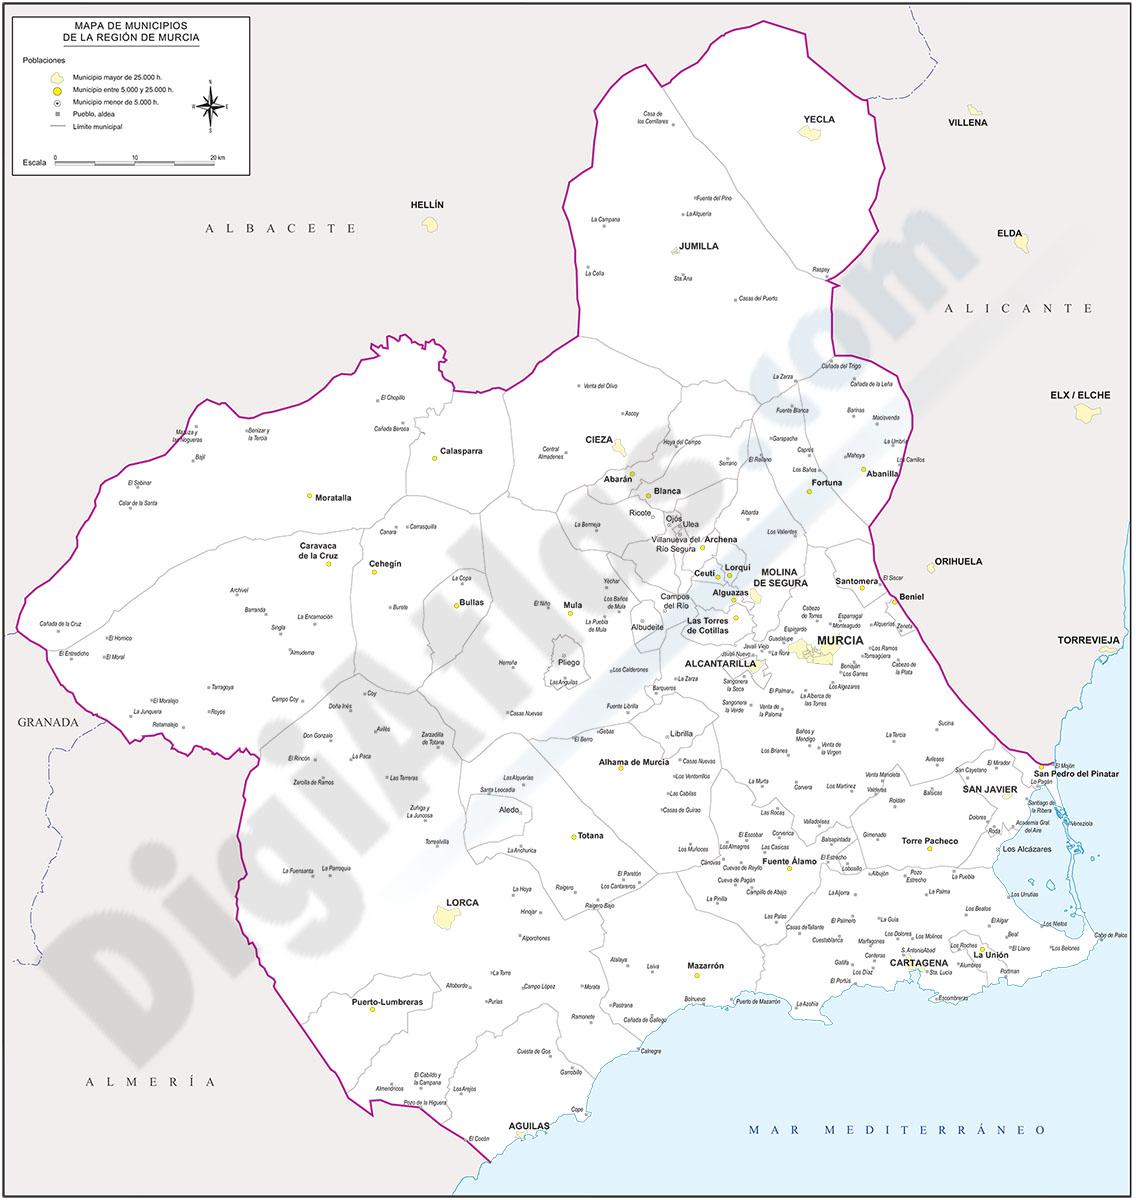 Map of Murcia with municipalities